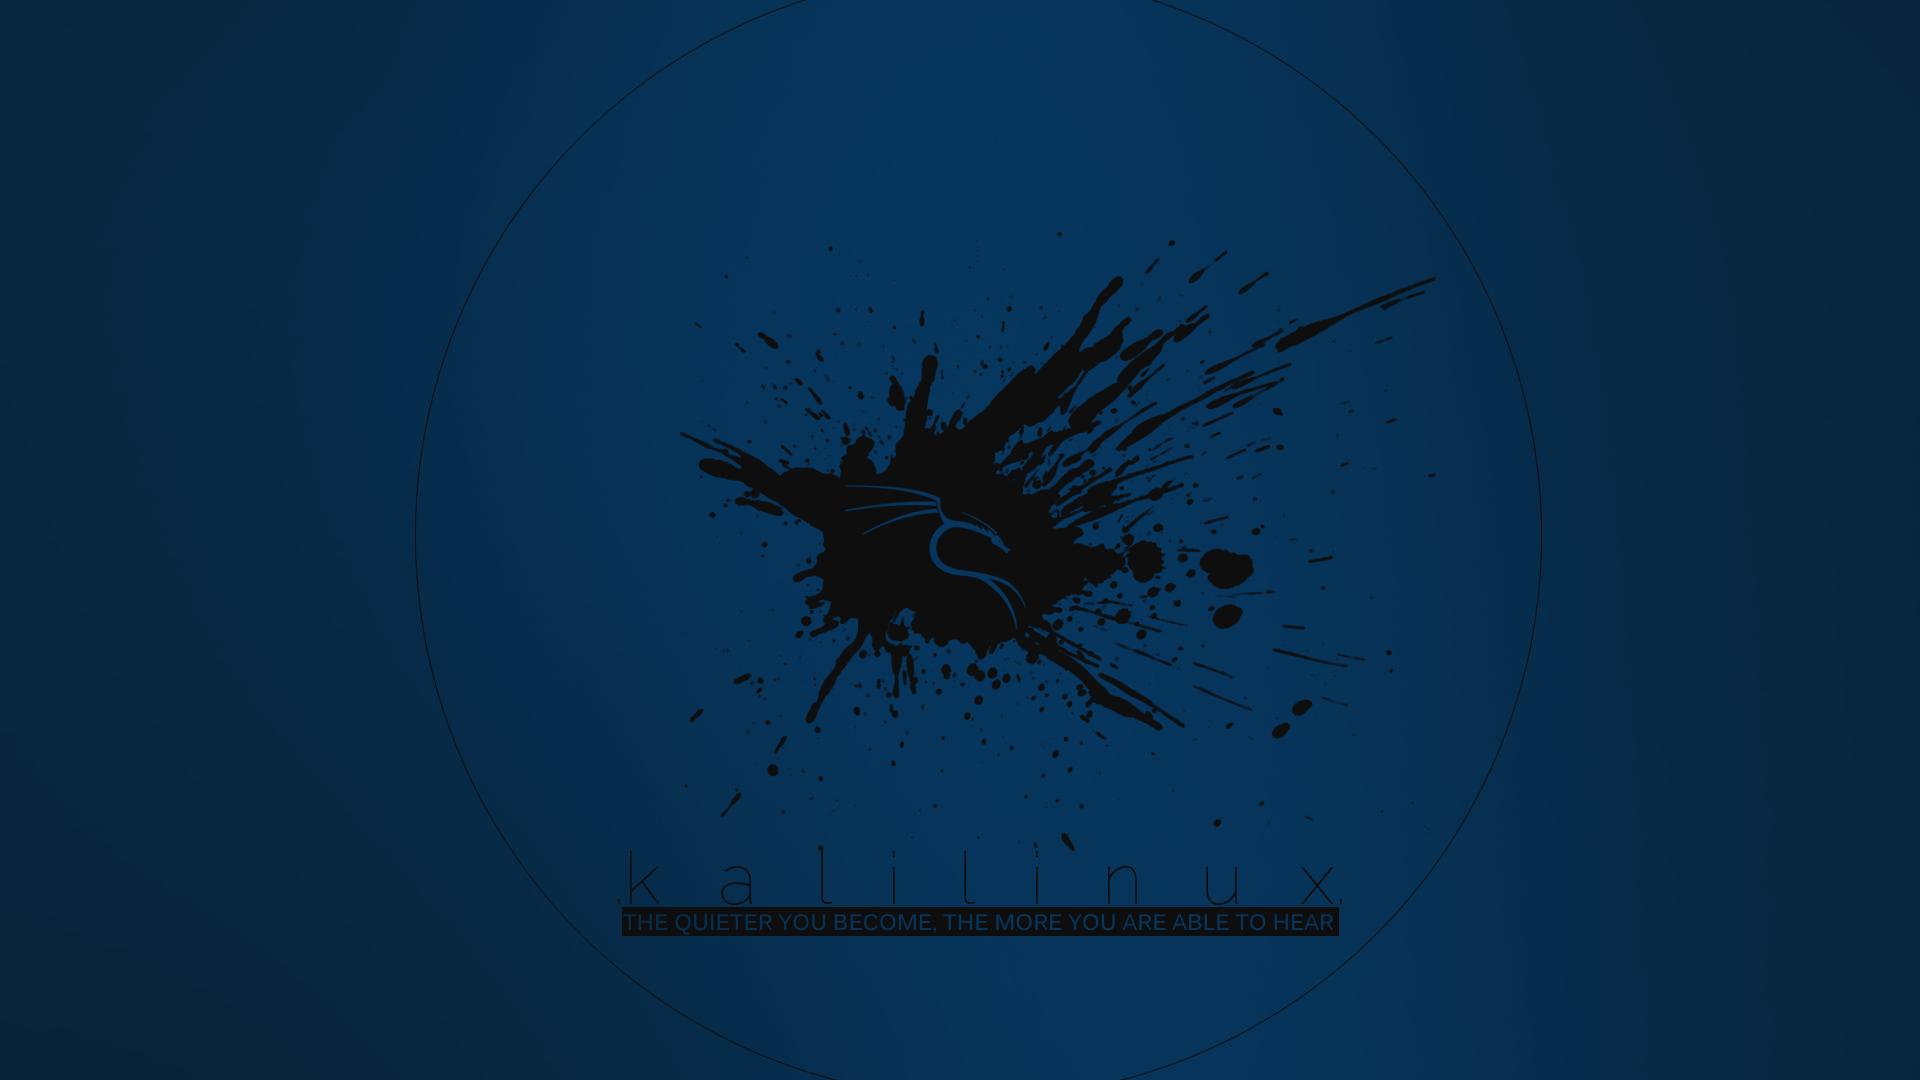 Kali Linux Hd Wallpaper Background Image 1920x1080 Id